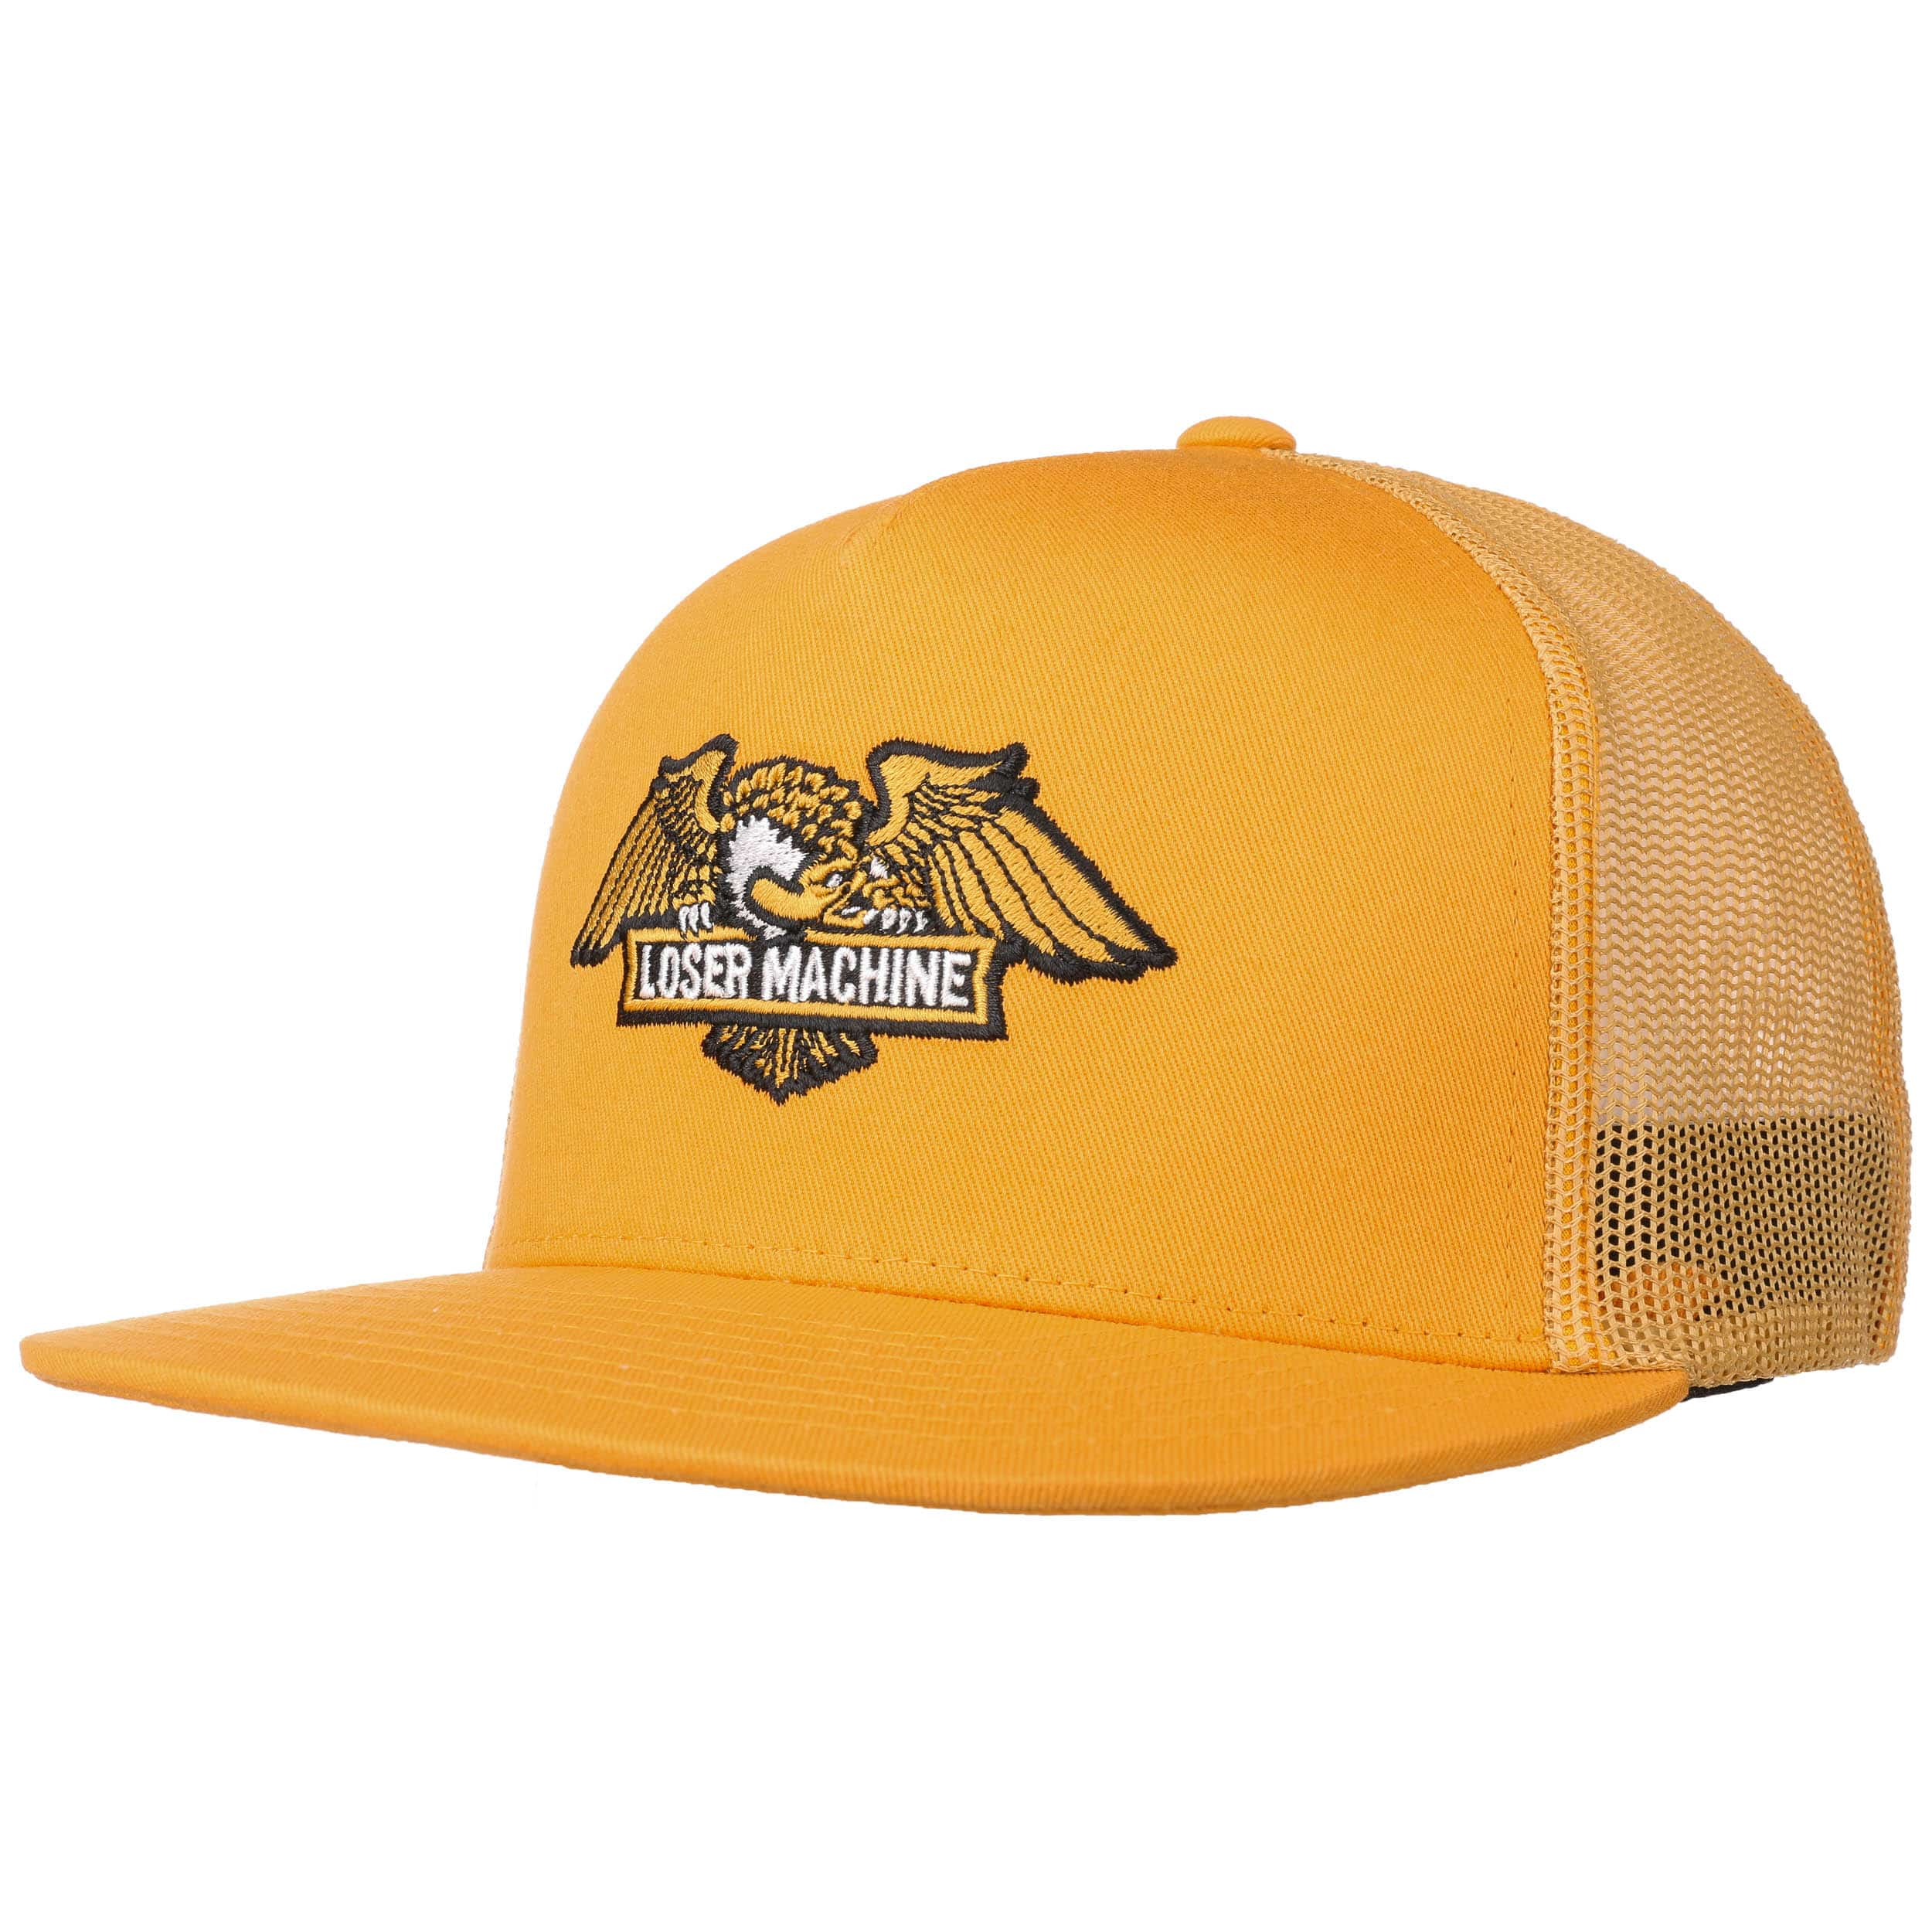 Loser Machine Wings Trucker Hat Black Snapback